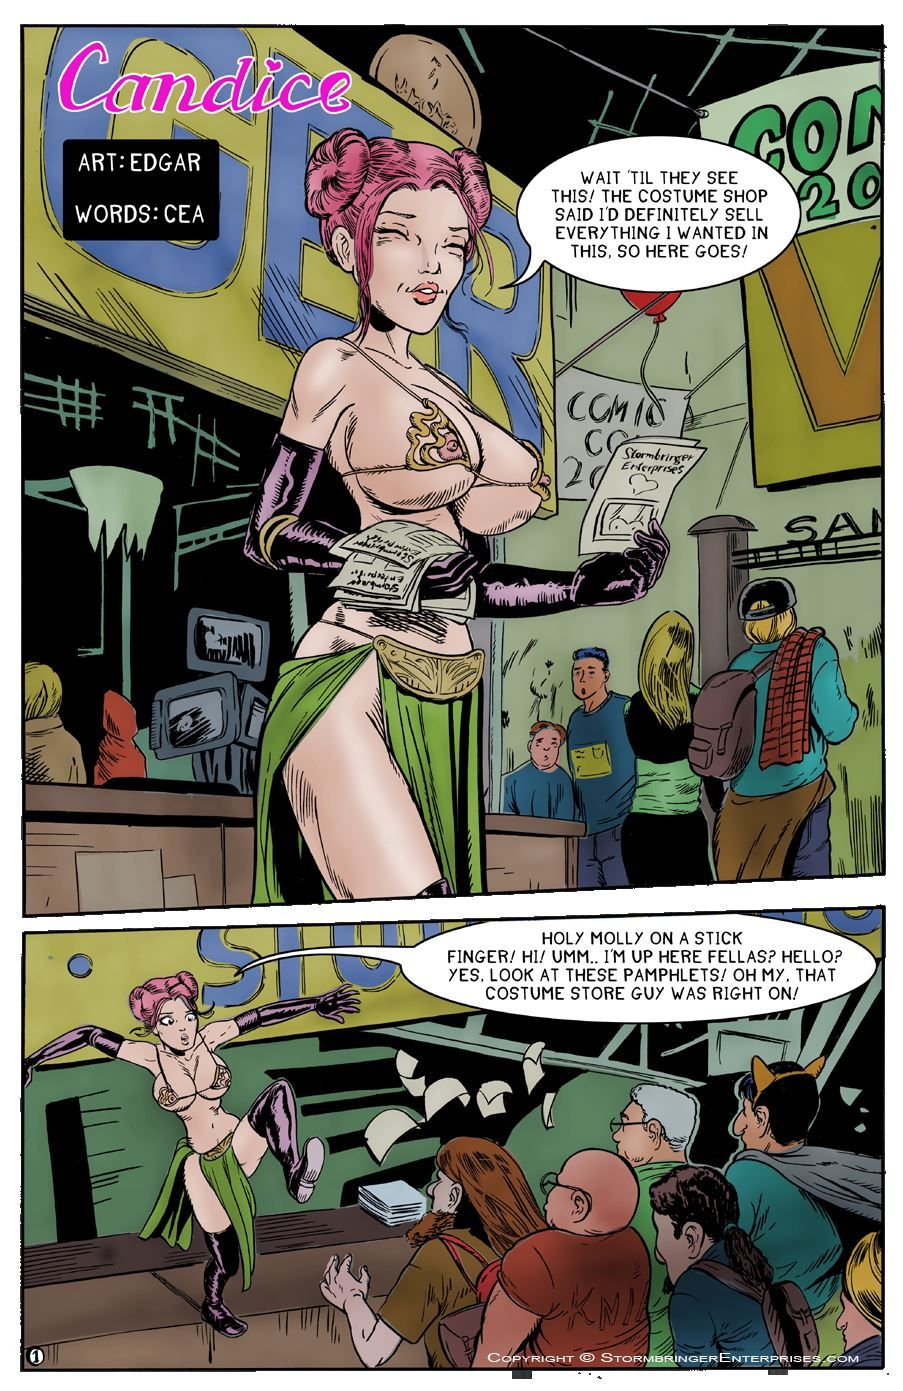 The Erotic Adventure of Candice - Comic con-sumation 5 4